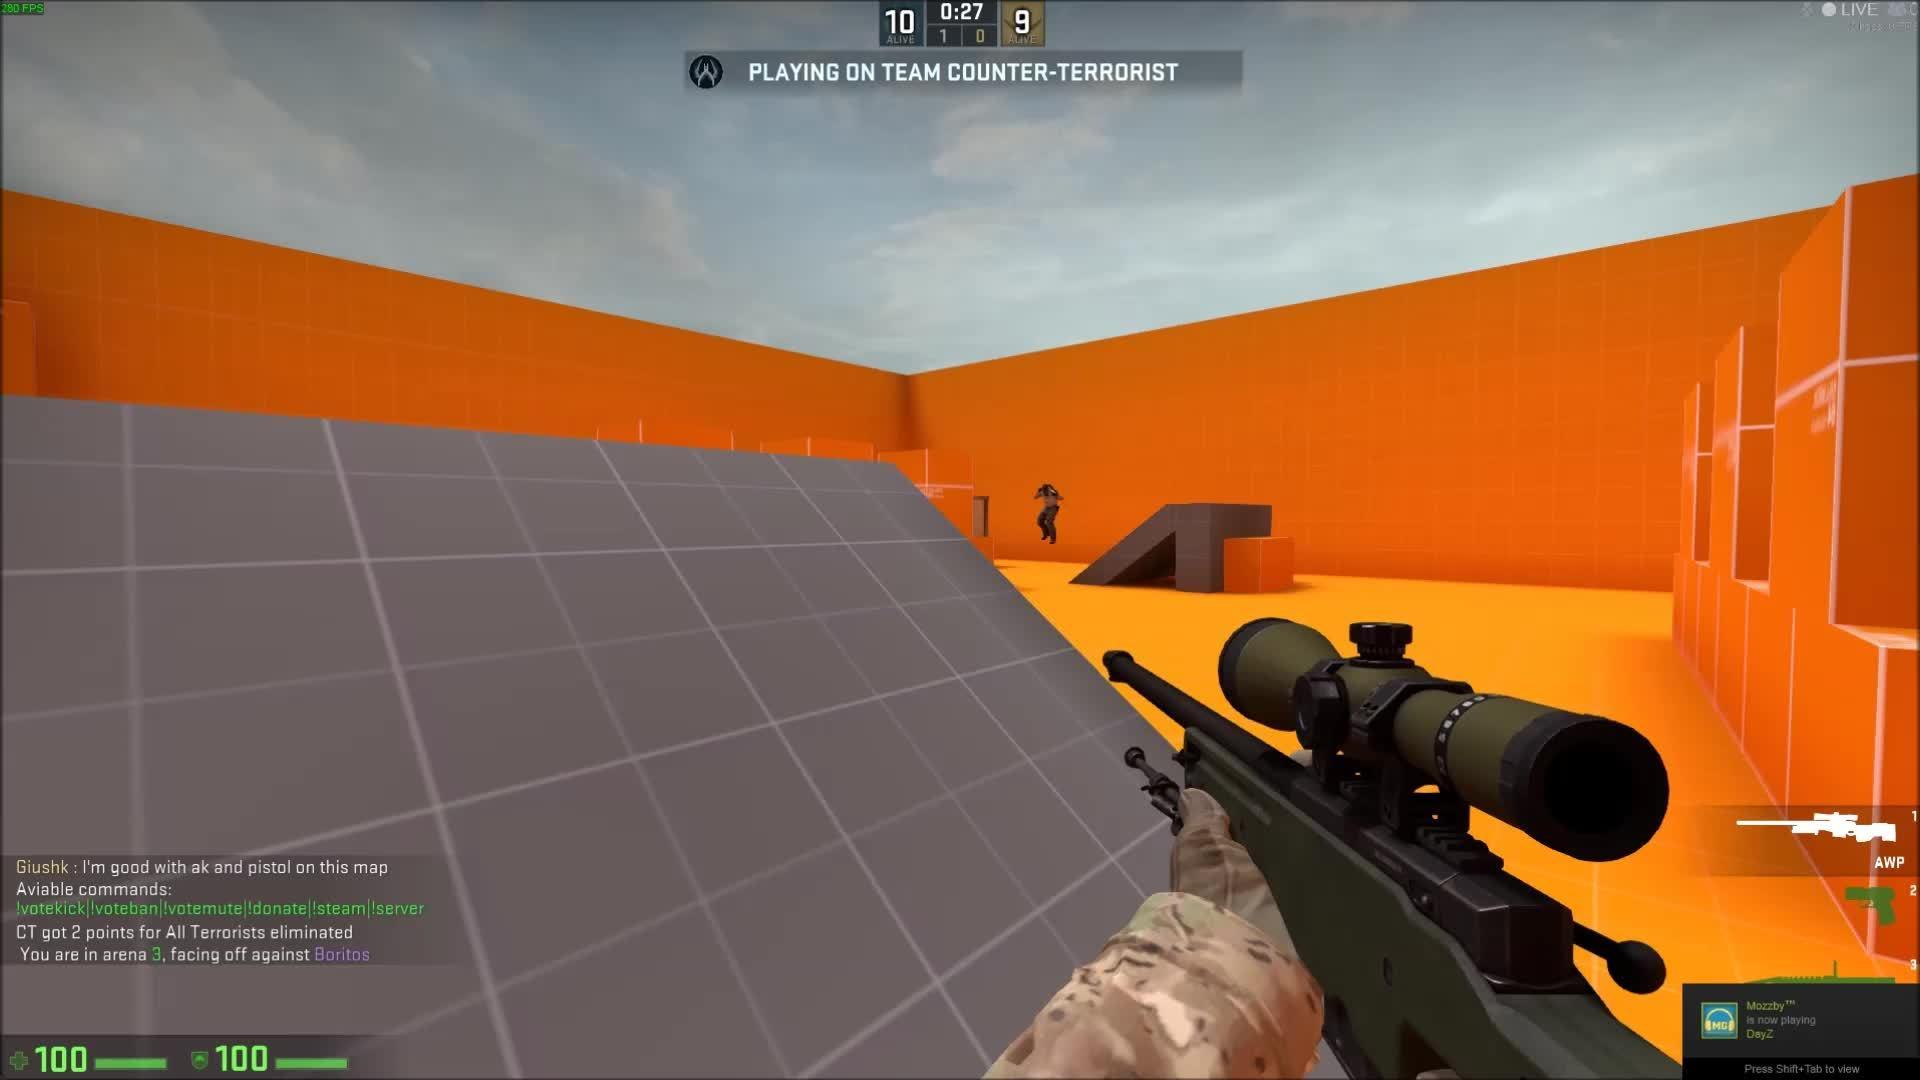 60fpsgaminggifs, [CSGO] Headshot Gameplay from an Aim Map (reddit) GIFs